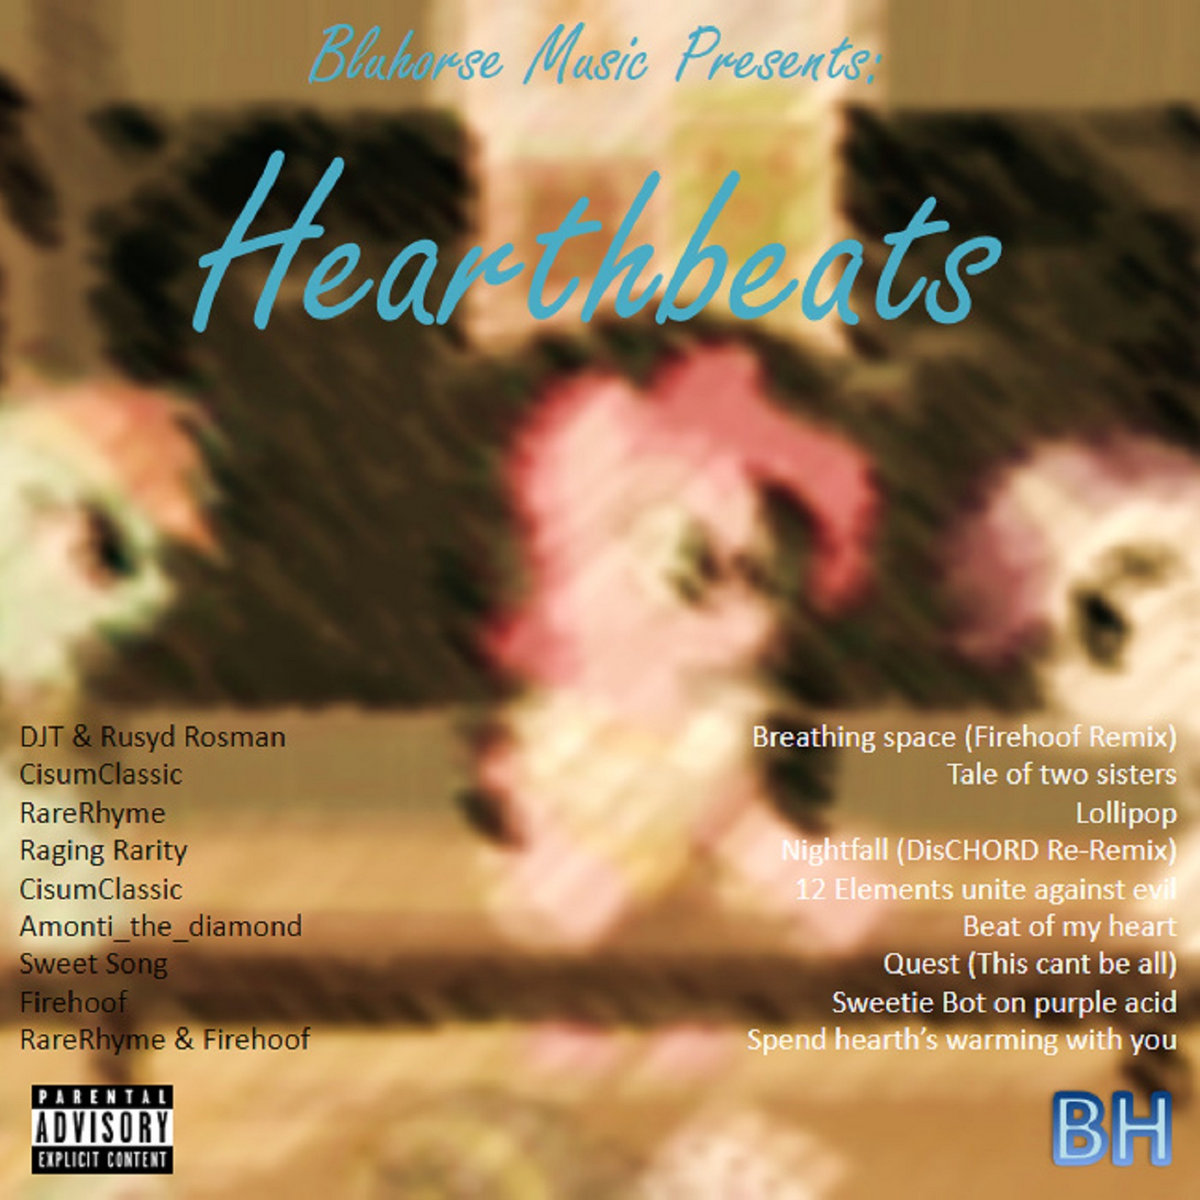 Hearthbeats | Bluhorse Music